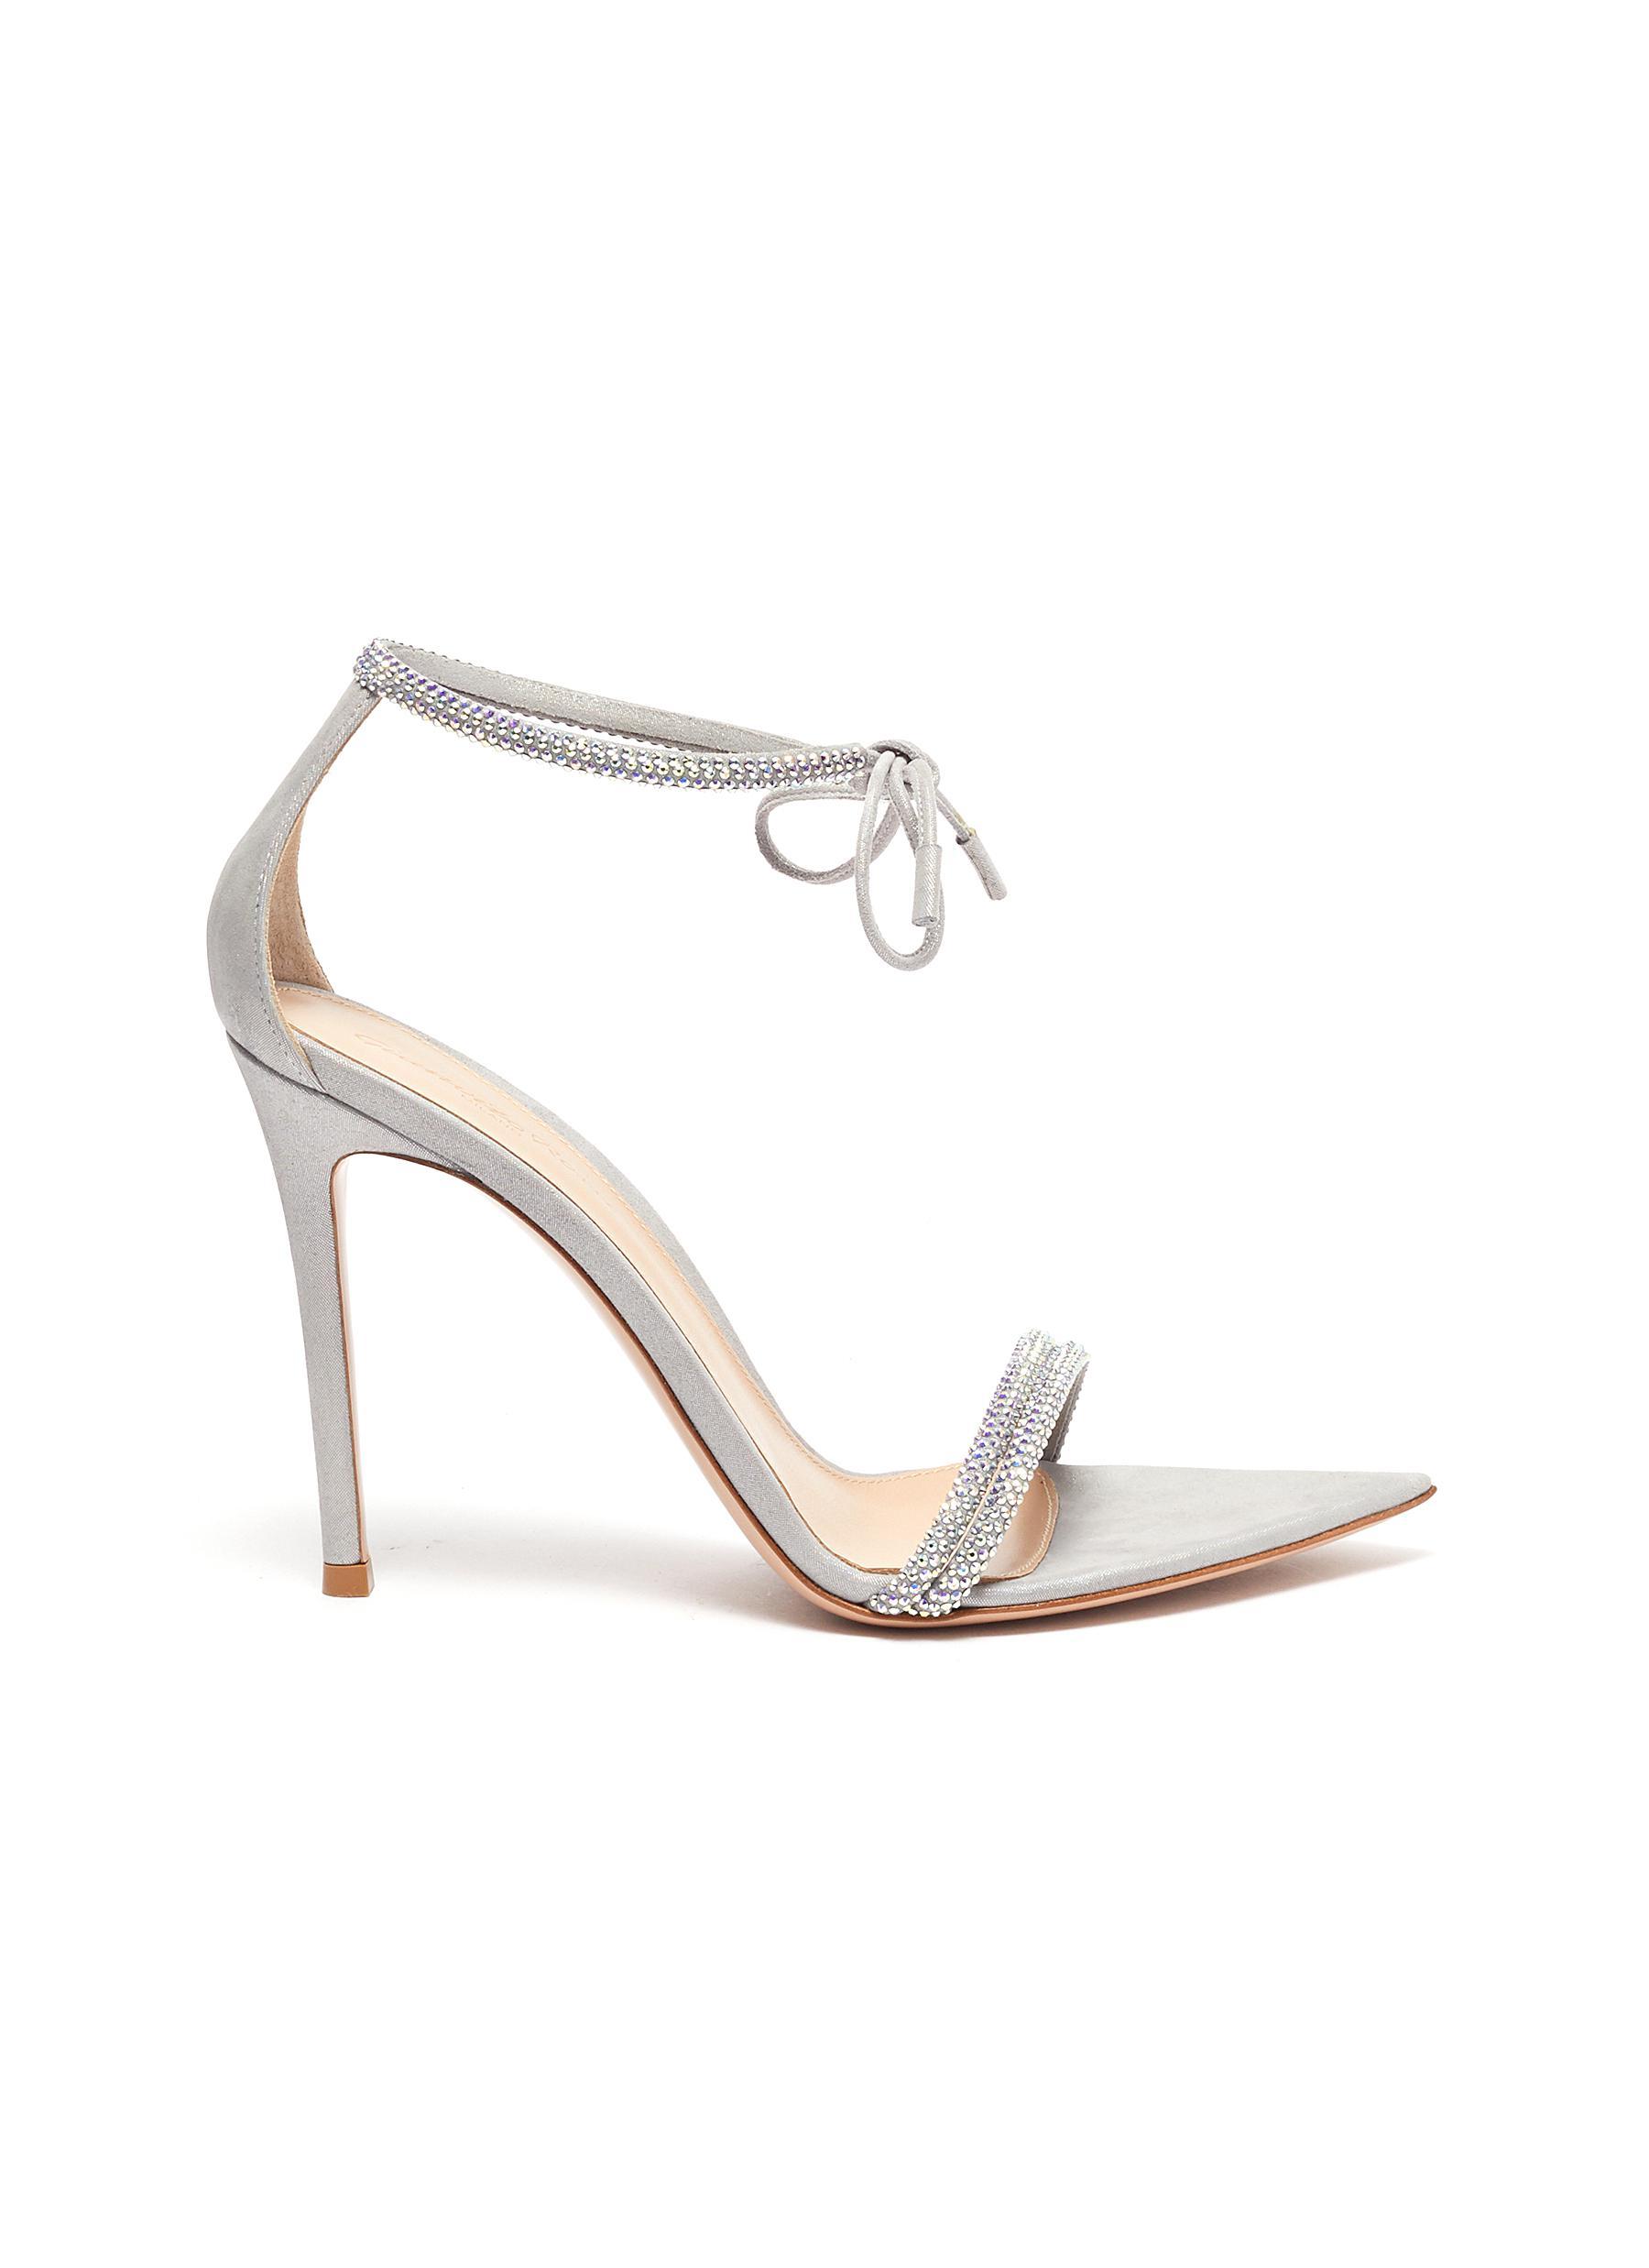 Gianvito Rossi High Heels Crystal embellished strap sandals